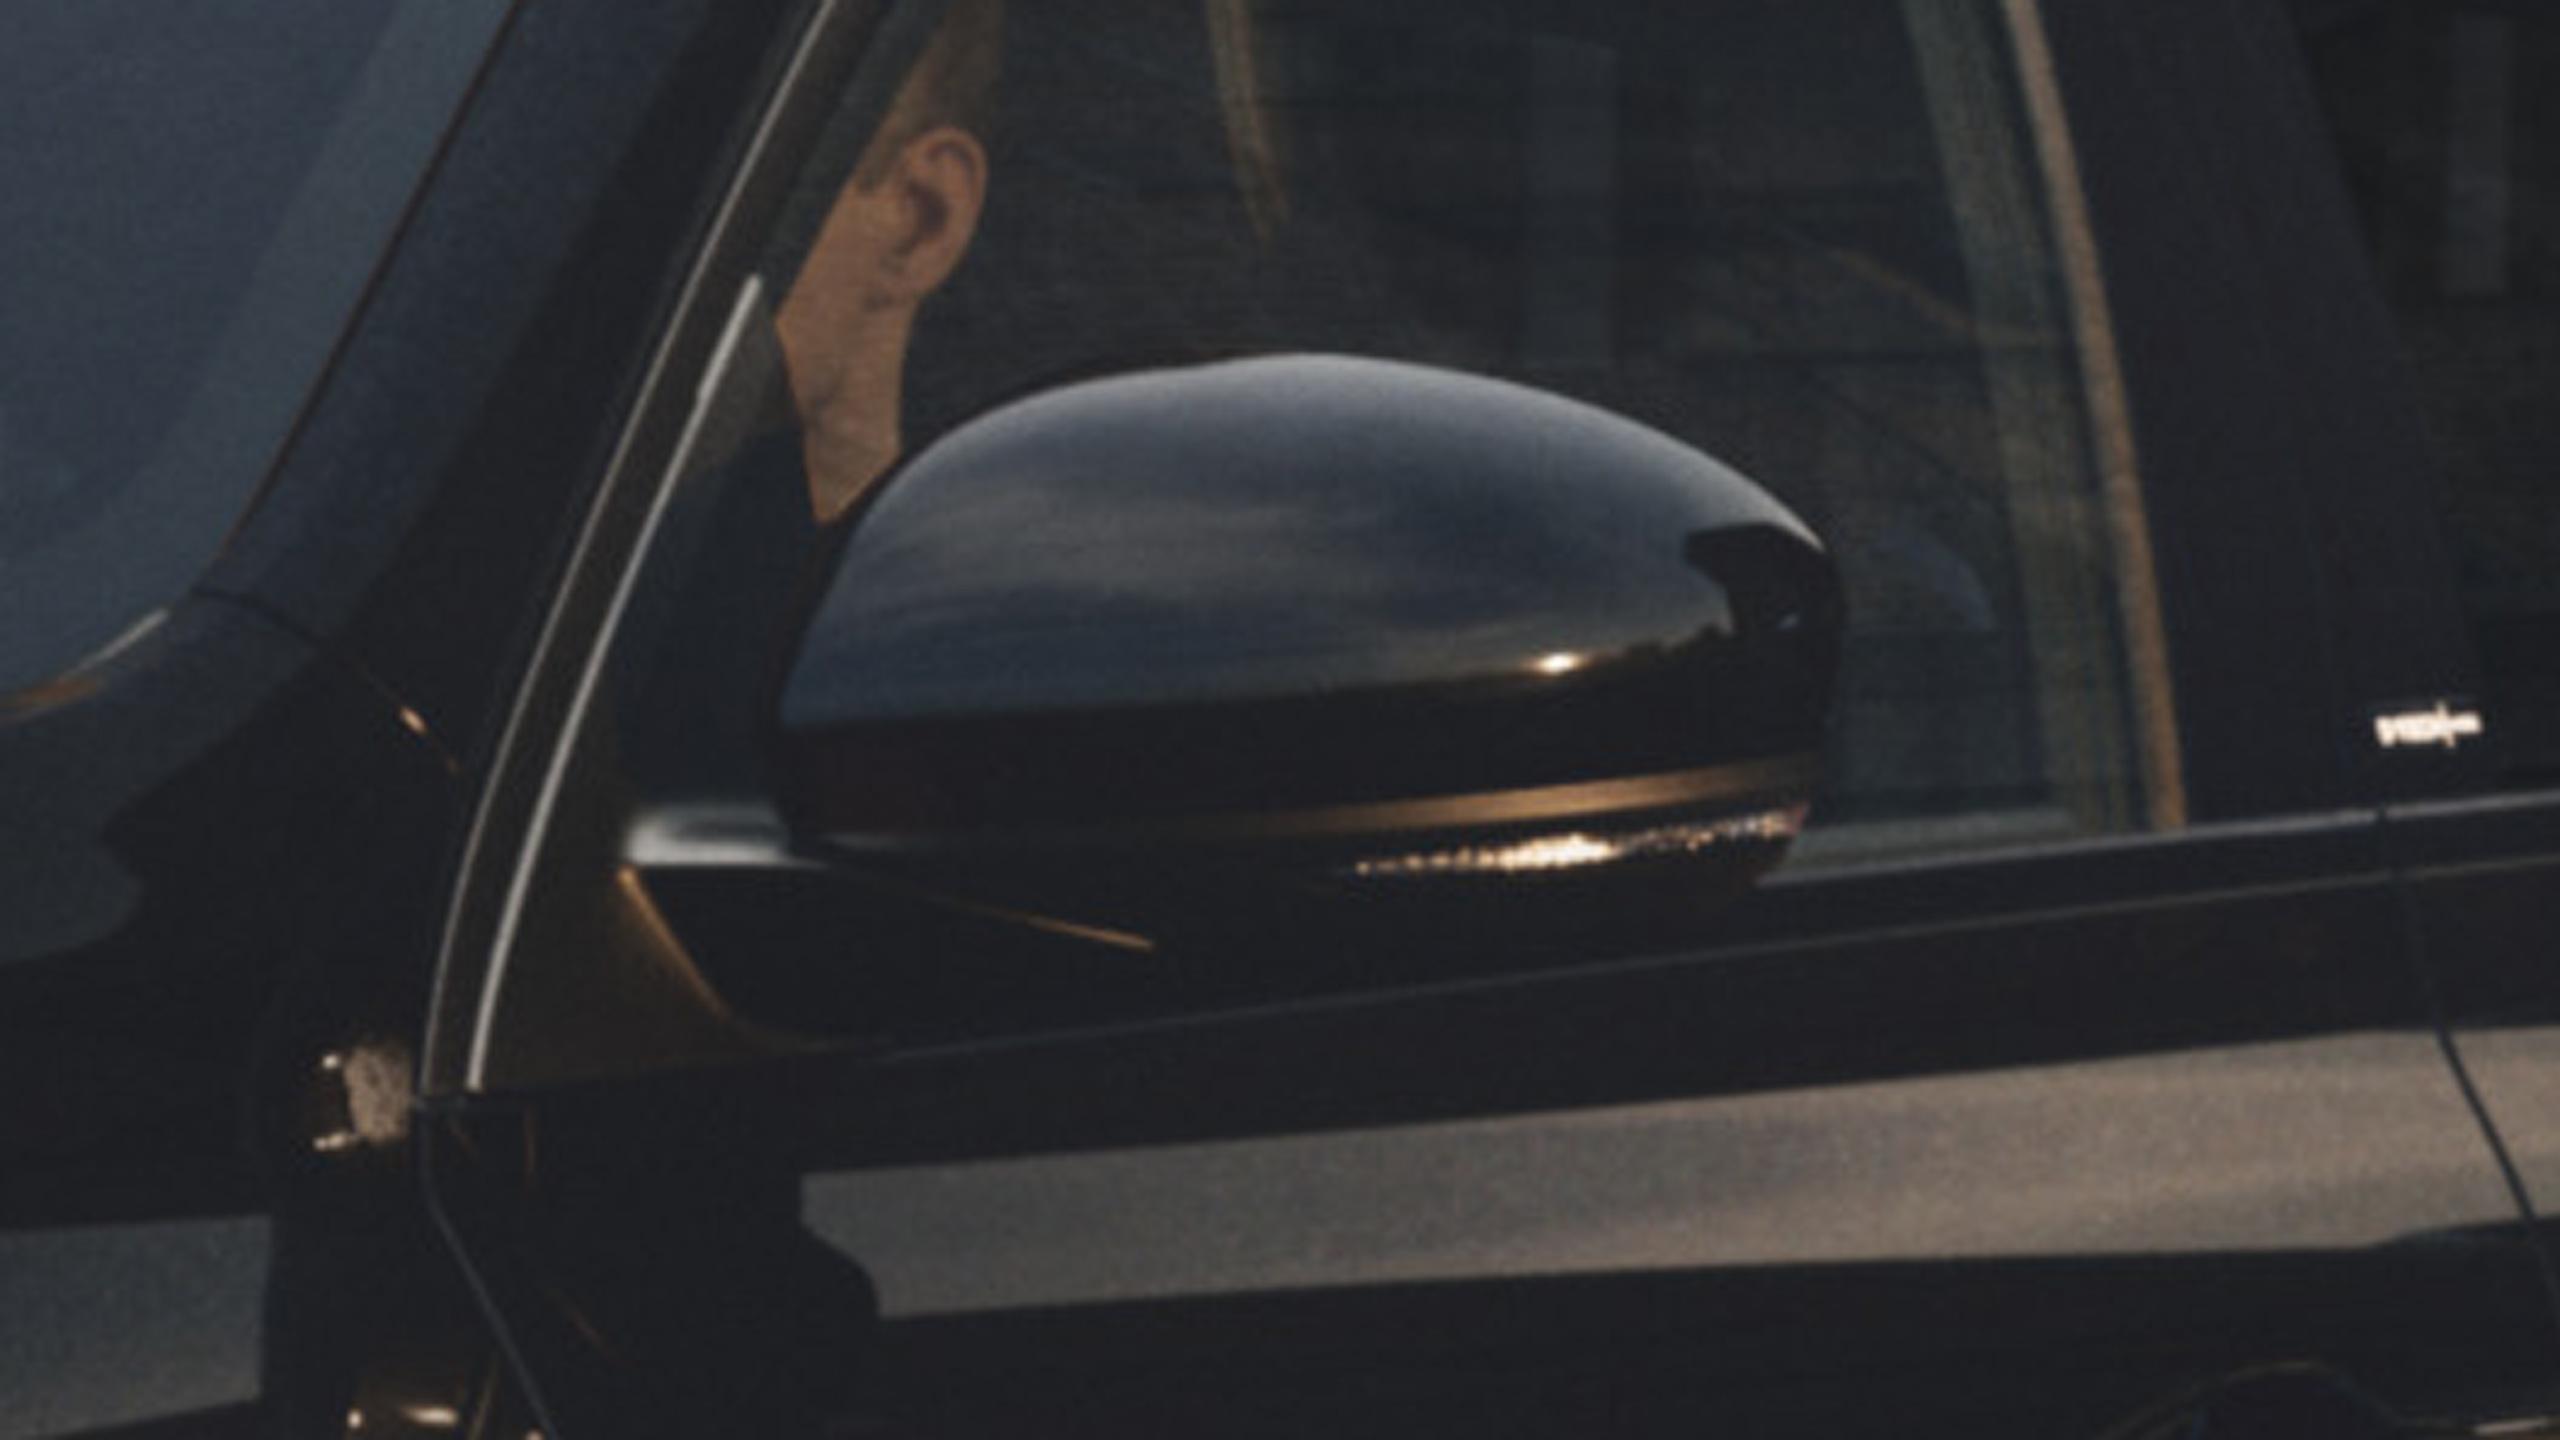 Body coloured rear-view mirros